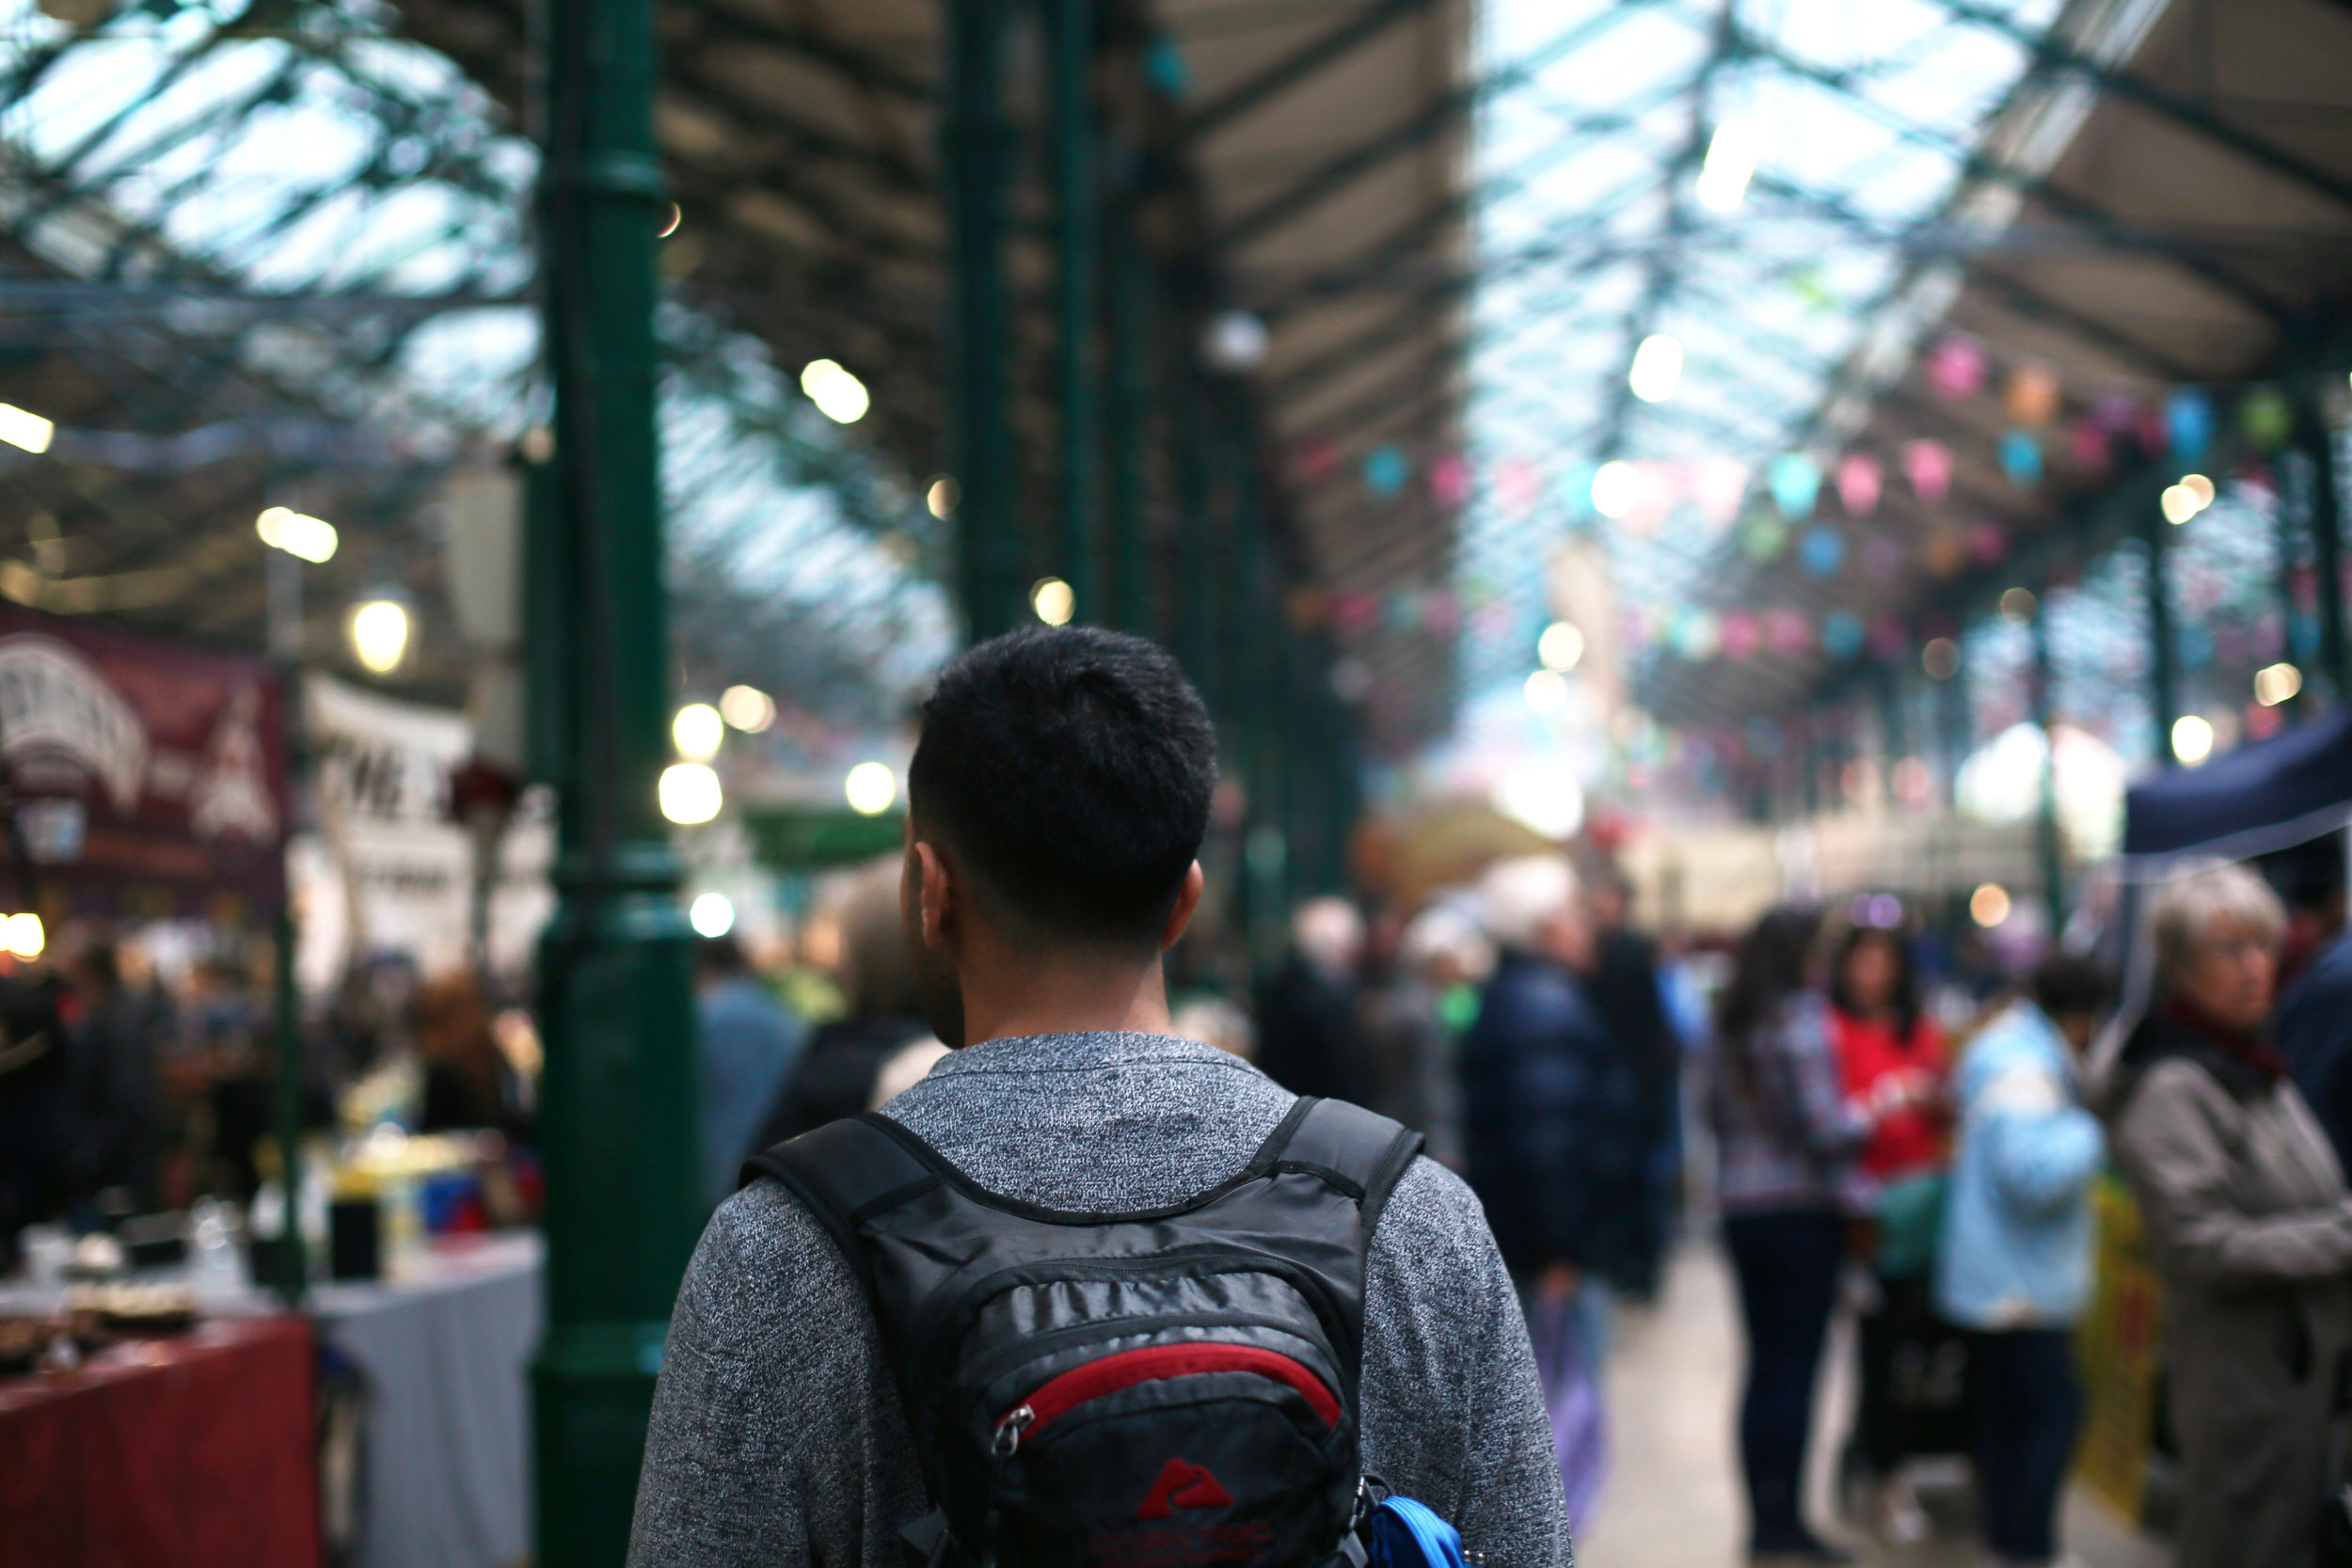 Umar at Saint George's Market in Belfast, Ireland